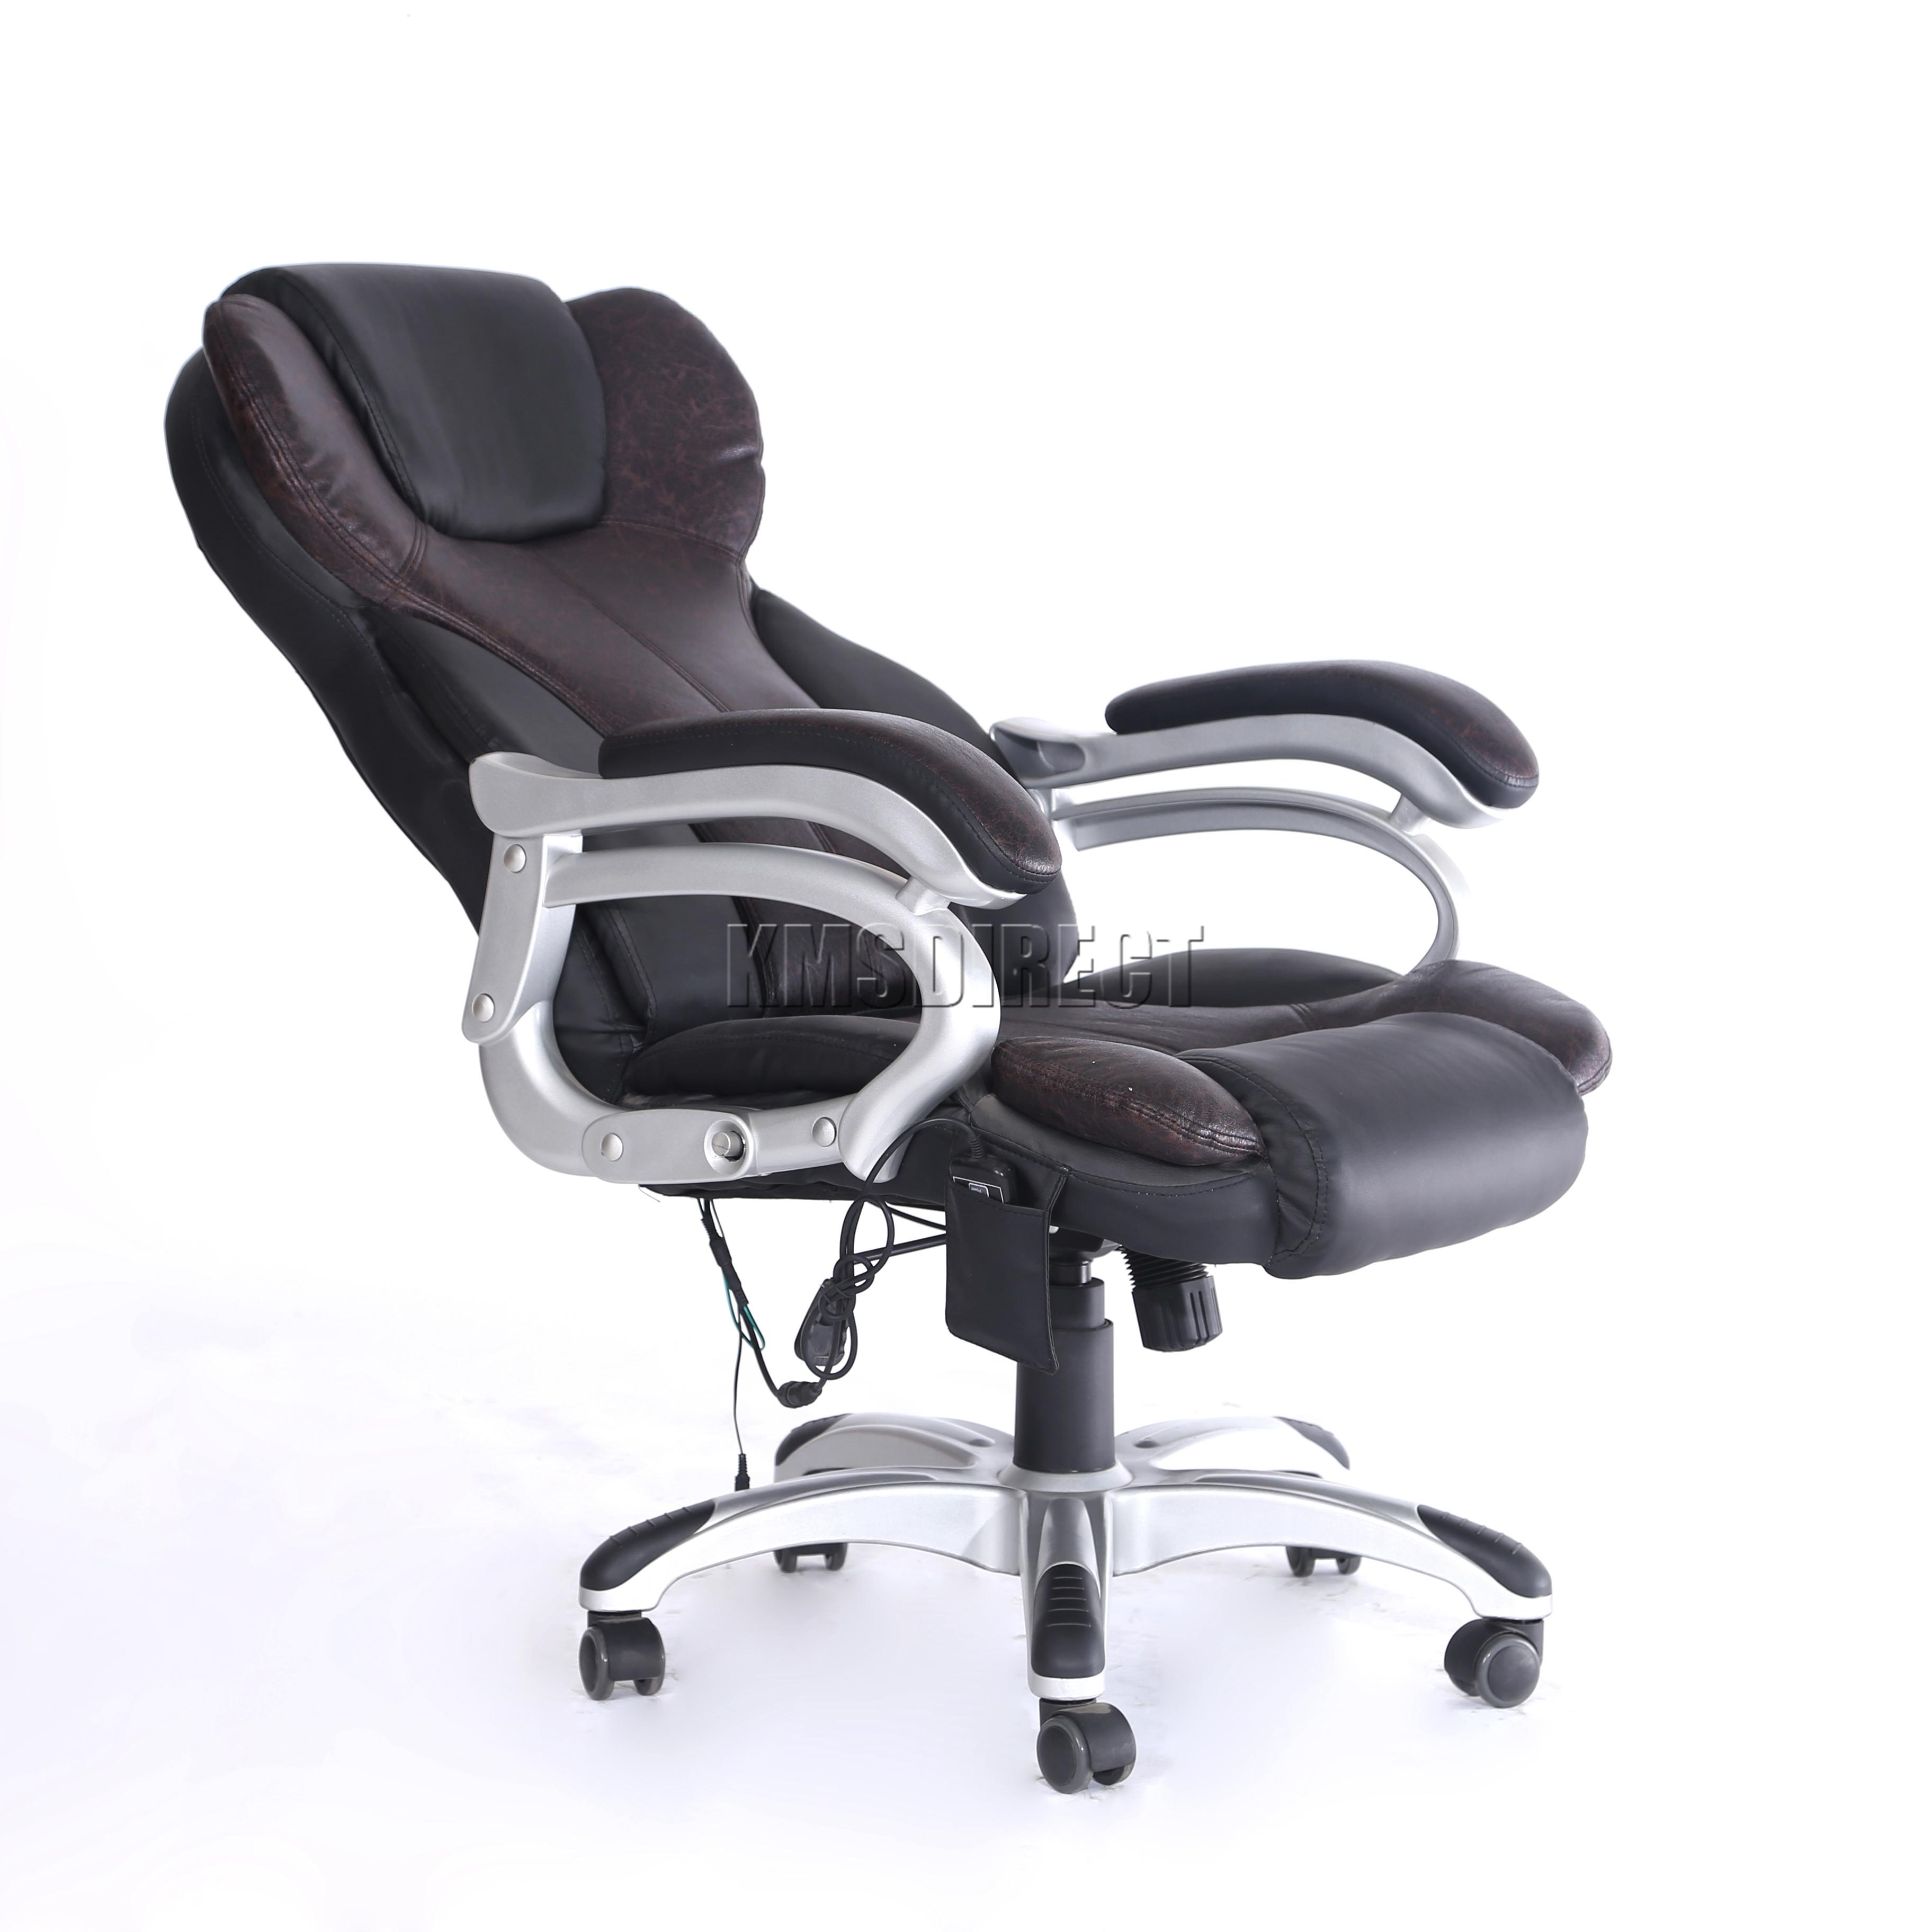 Sentinel Foxhunter Luxury 6 Point Massage Office Computer Chair Reclining Mc8074 Brown